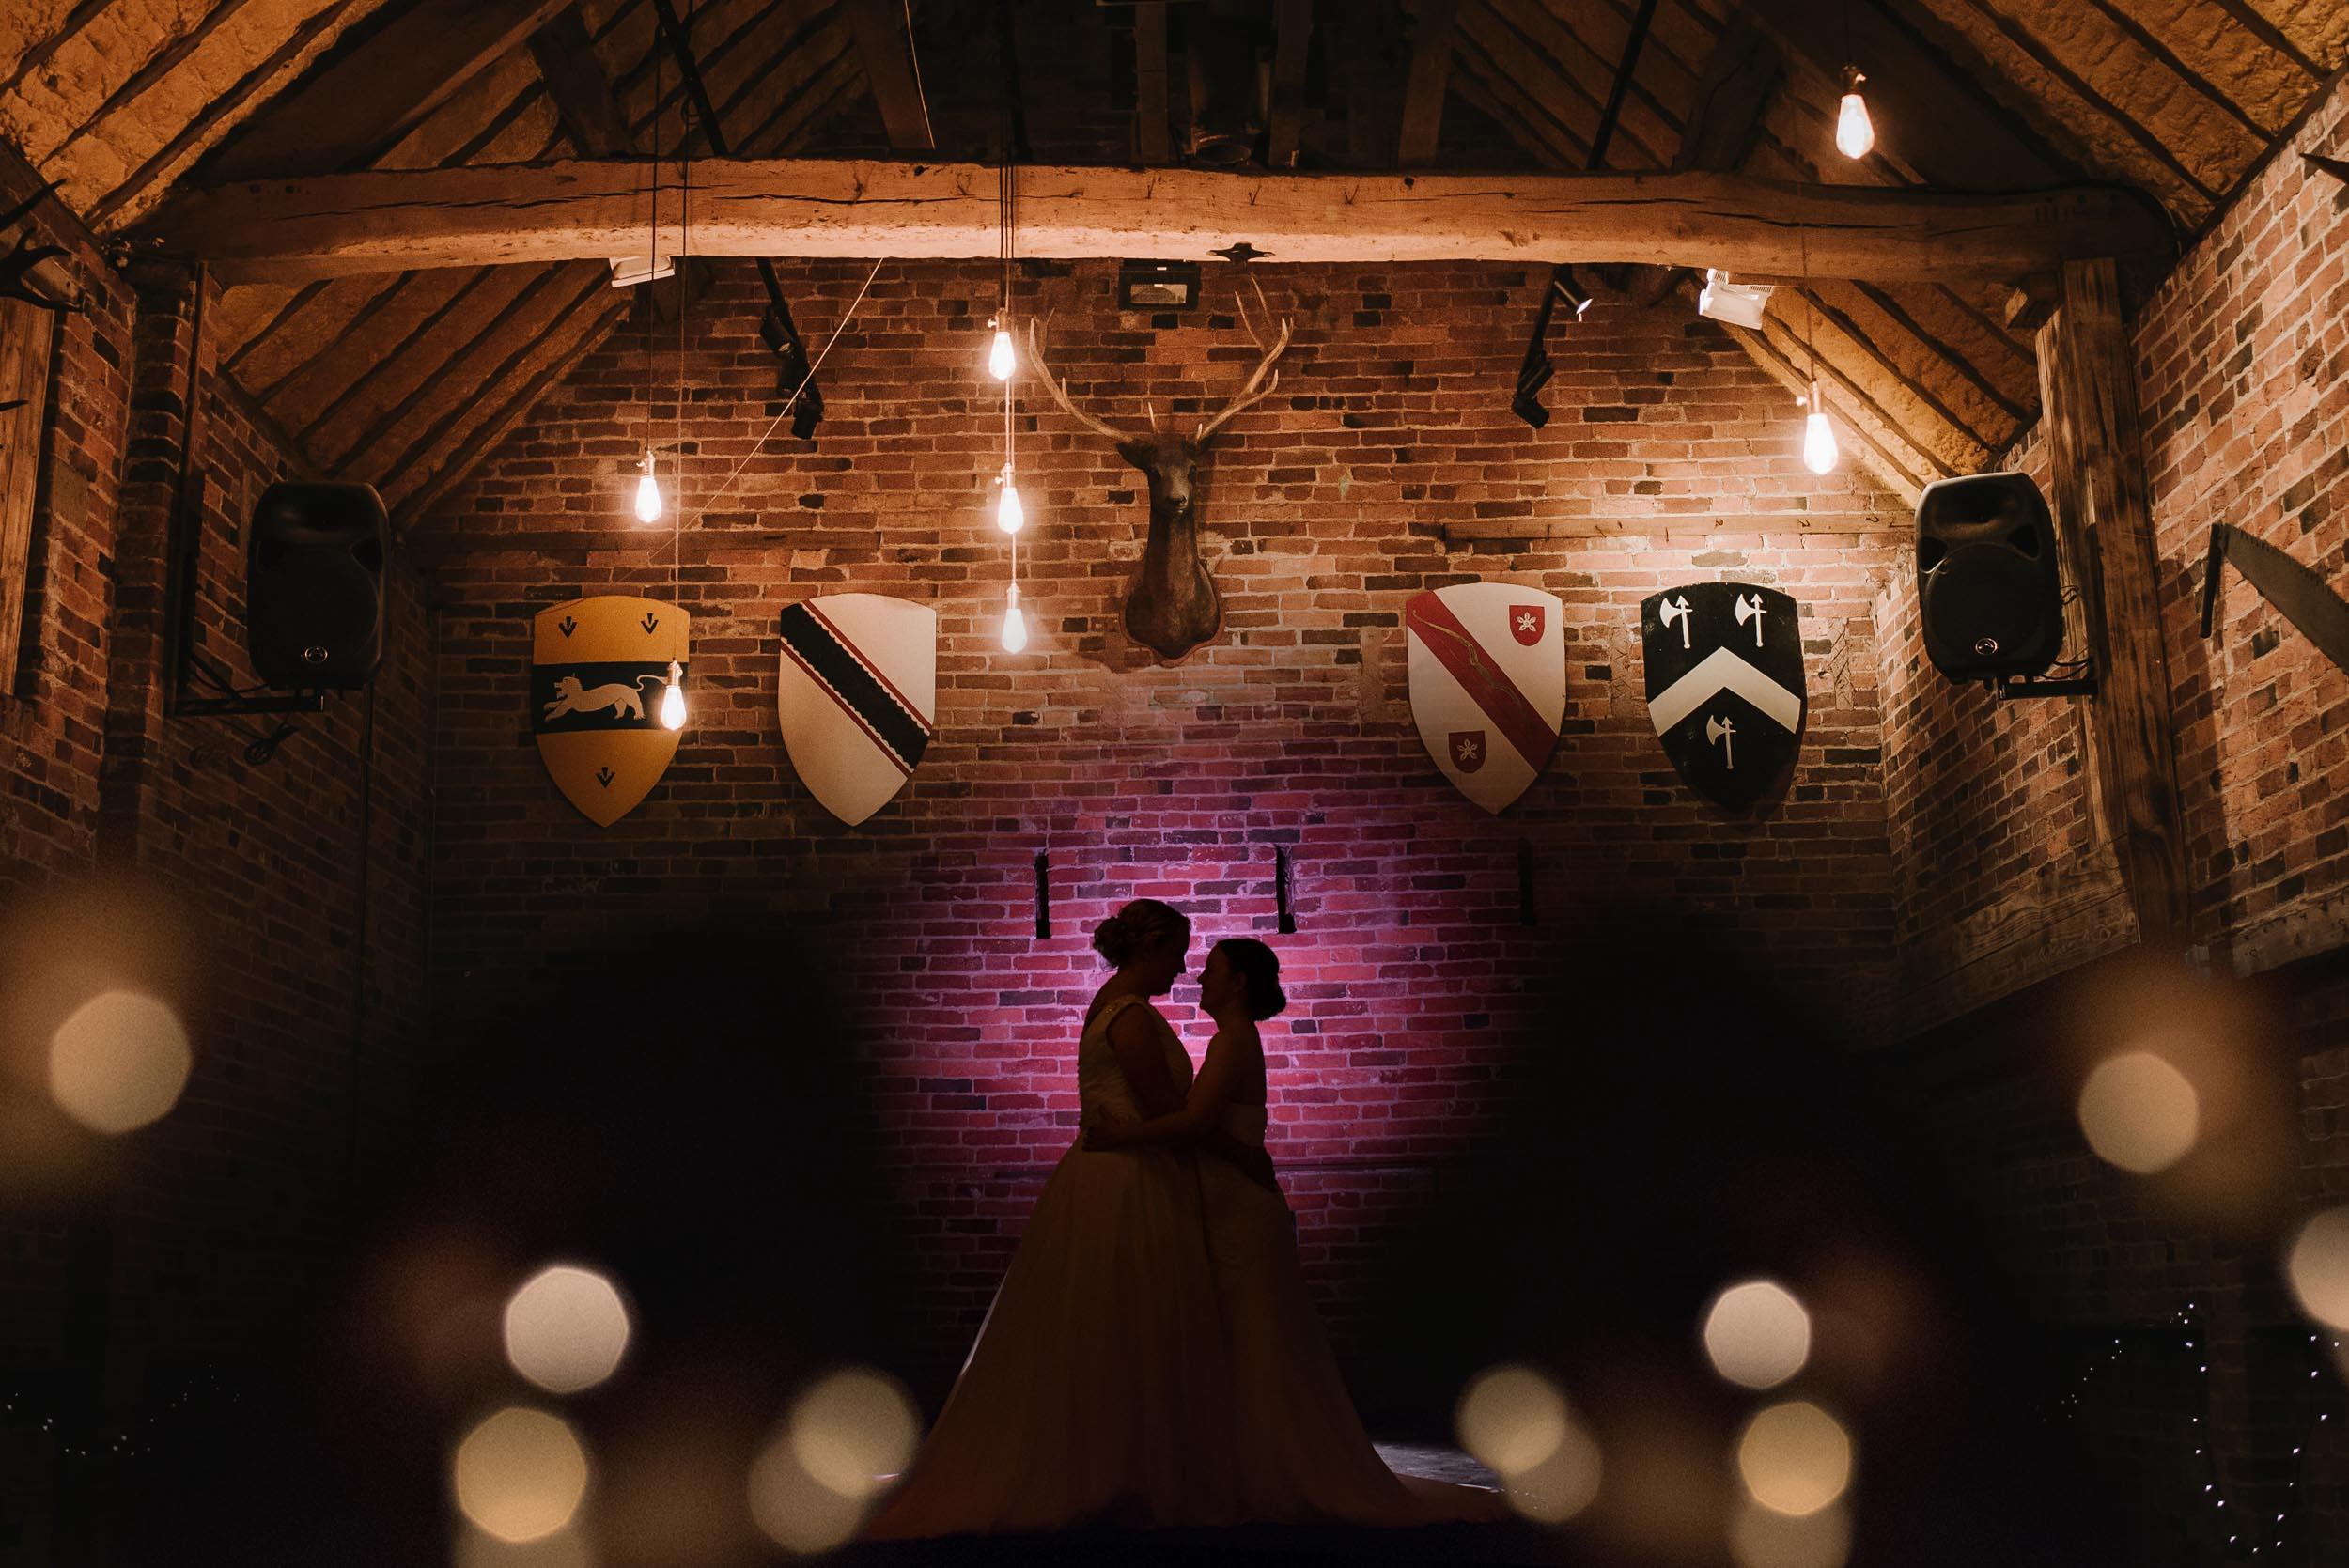 Donington-park-farm-wedding-photography-700.jpg